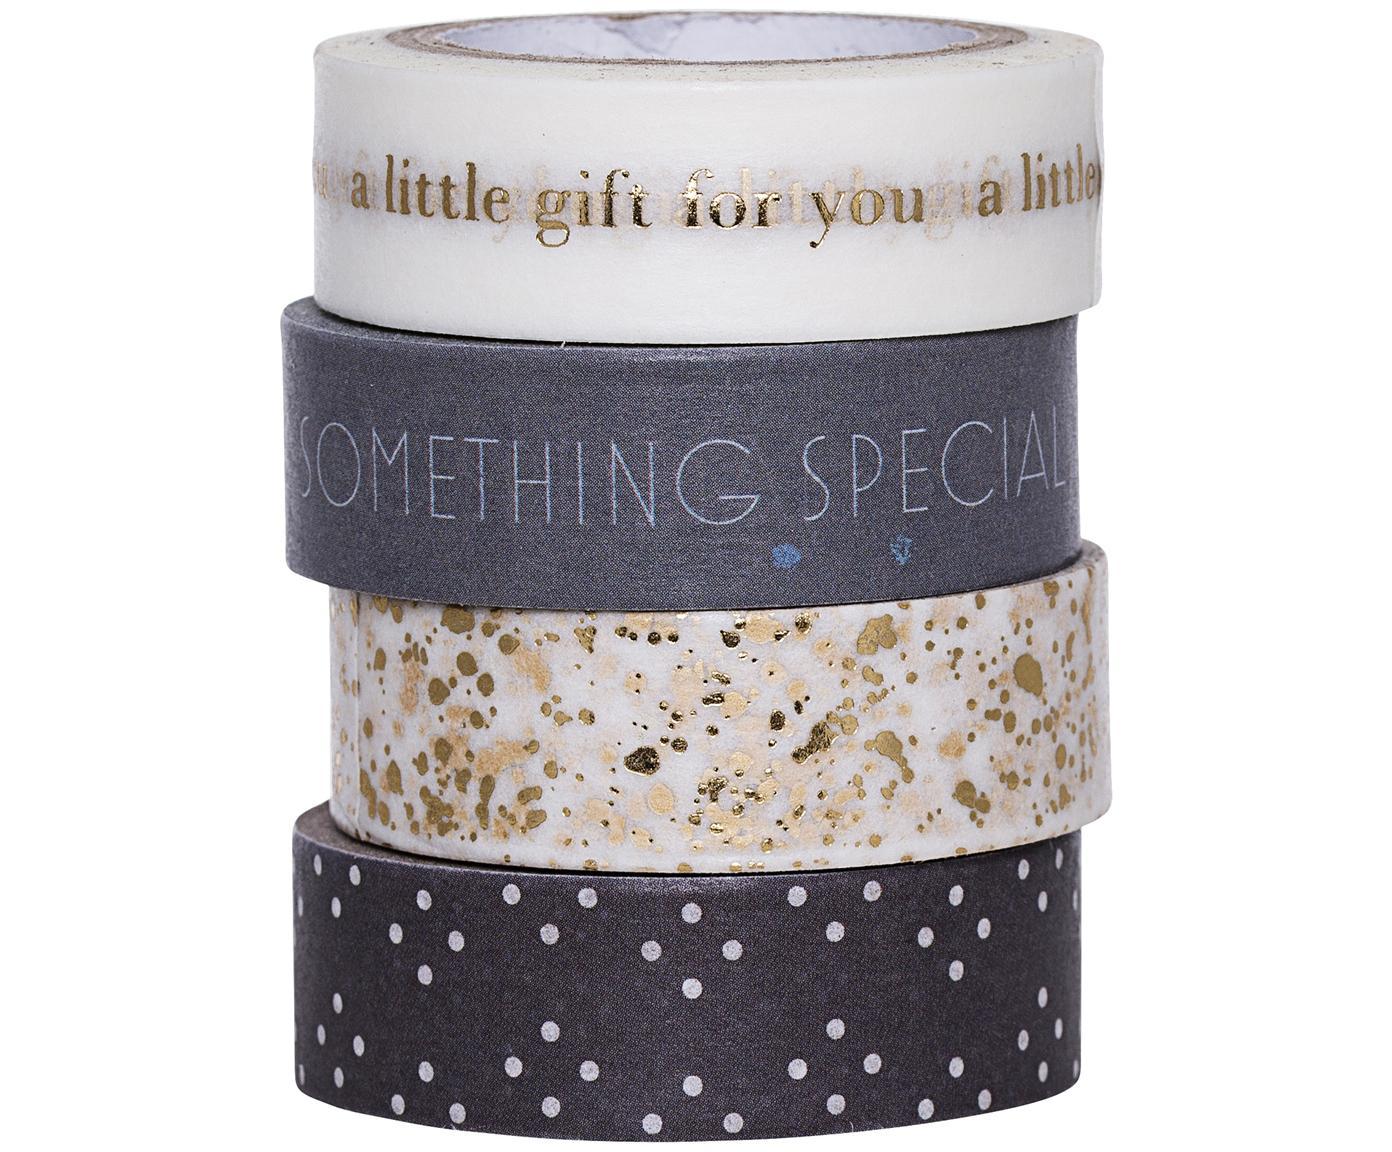 Plakbandset Special, 4-delig, Papier, Wit, goudkleurig, grijs, L 800 cm